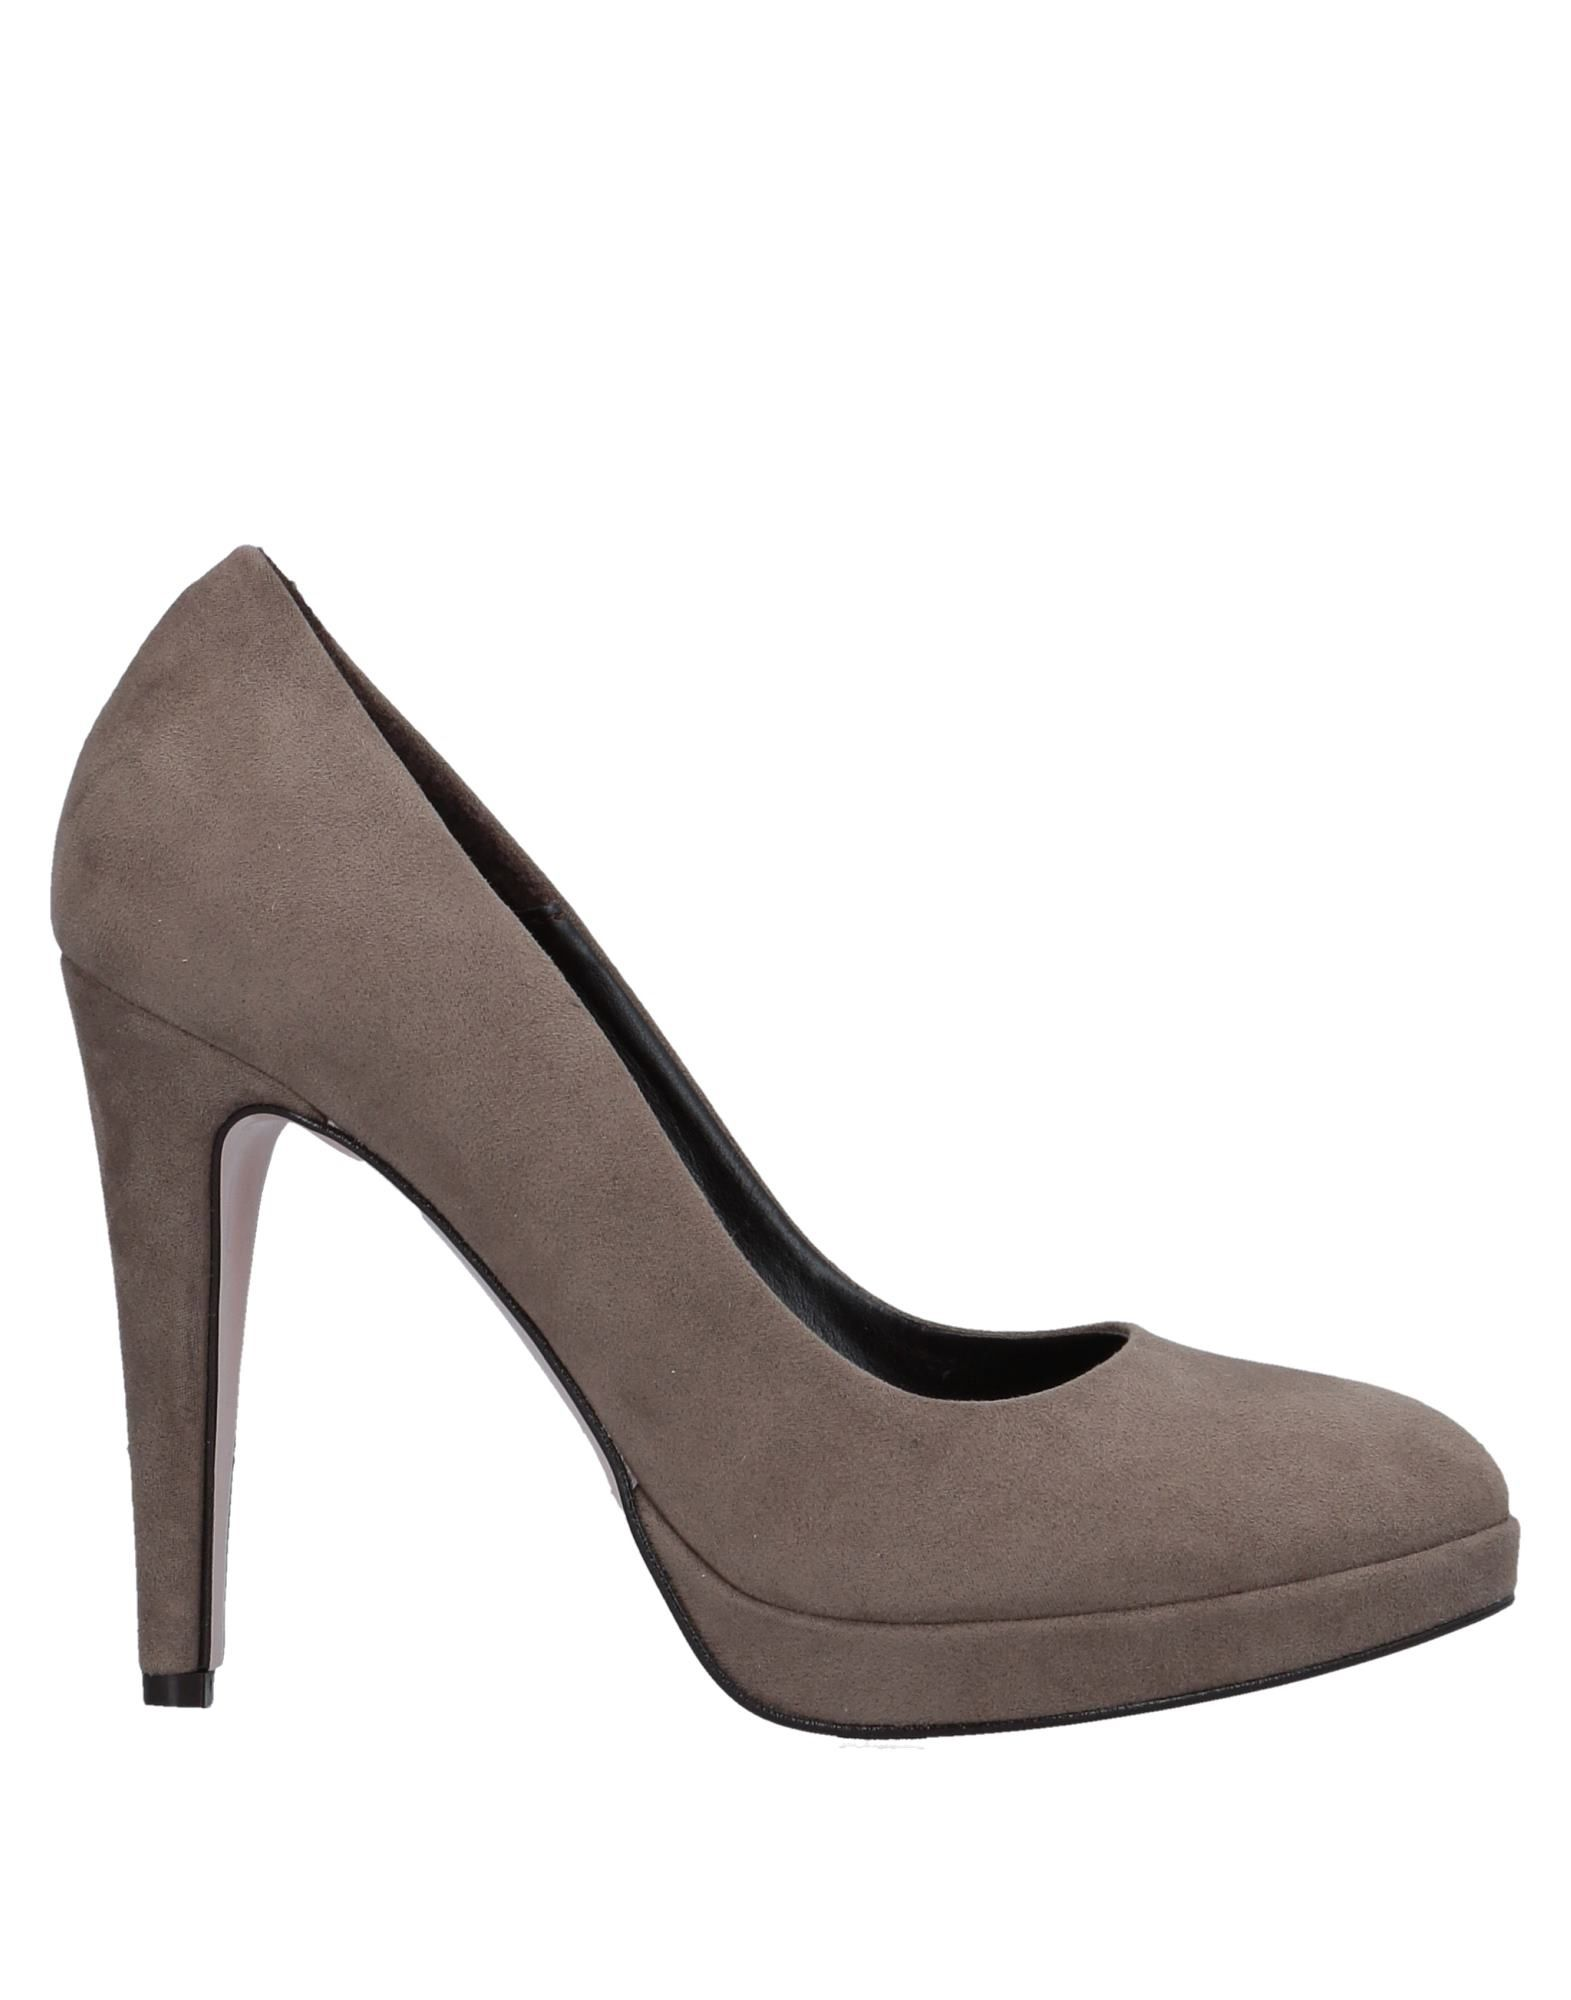 Tipe E Tacchi Pumps Damen  11533054VV Gute Qualität Qualität Qualität beliebte Schuhe 09d082